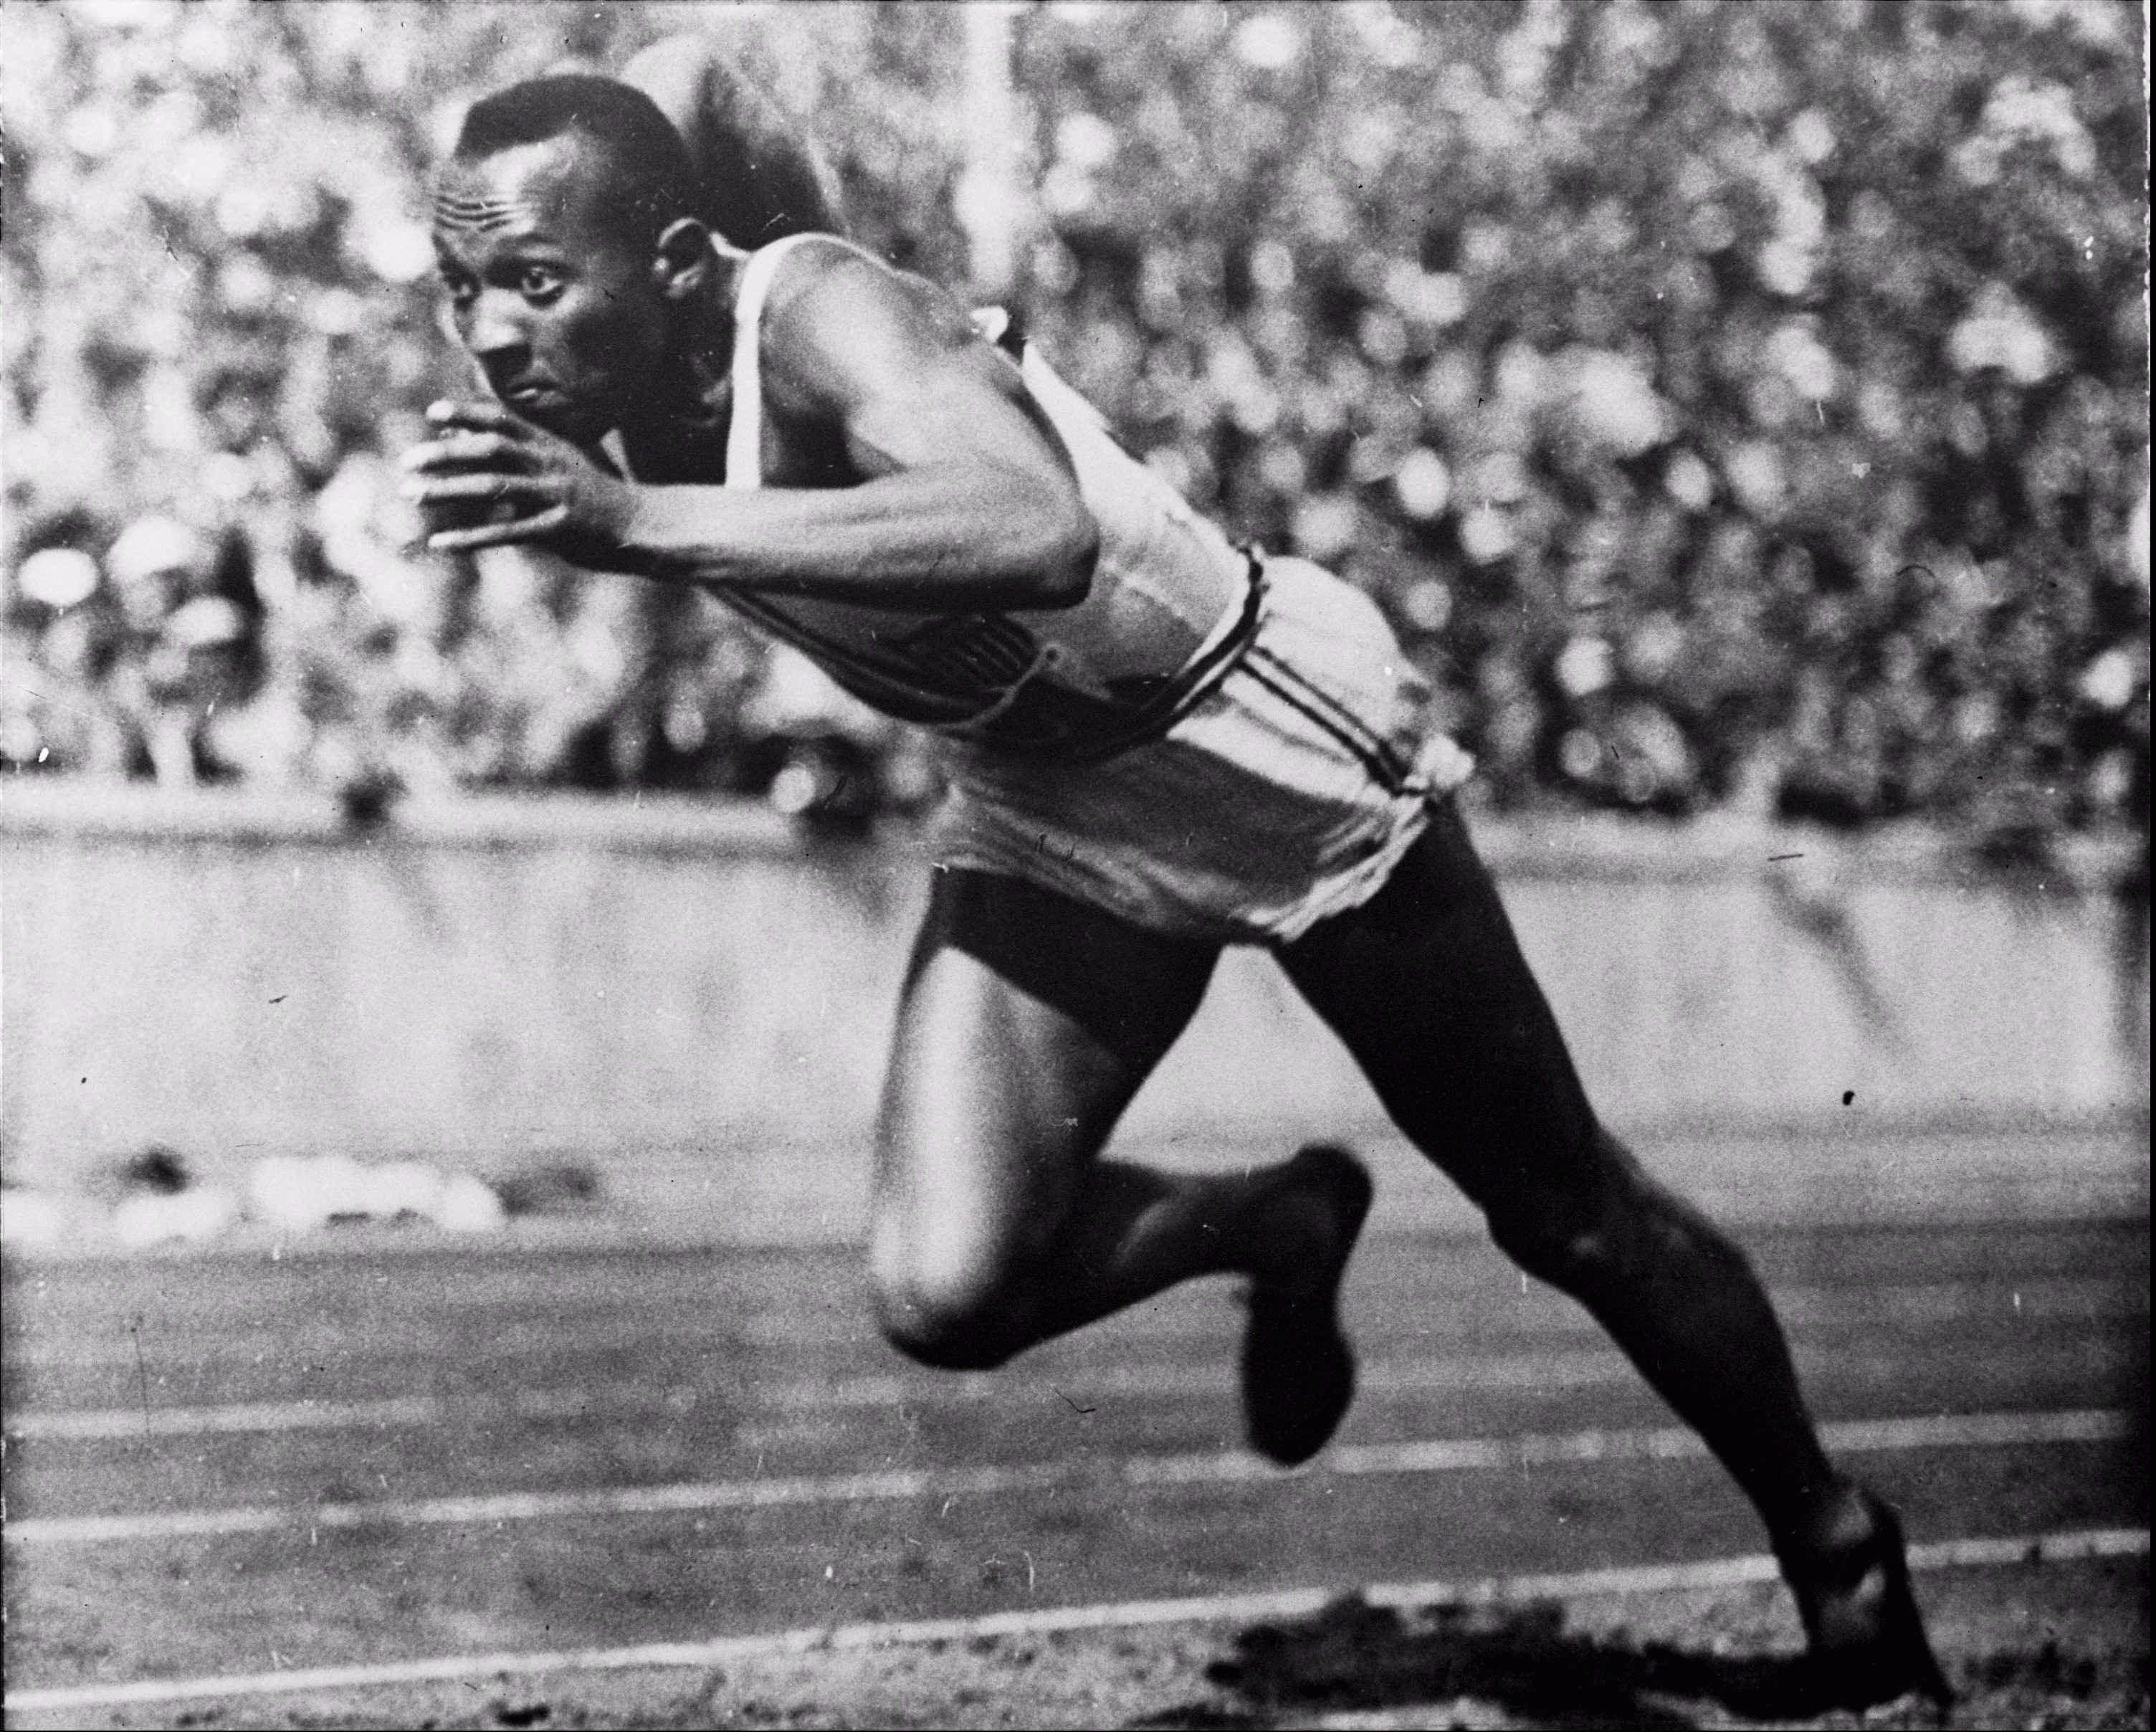 Jesse Owens sprinting